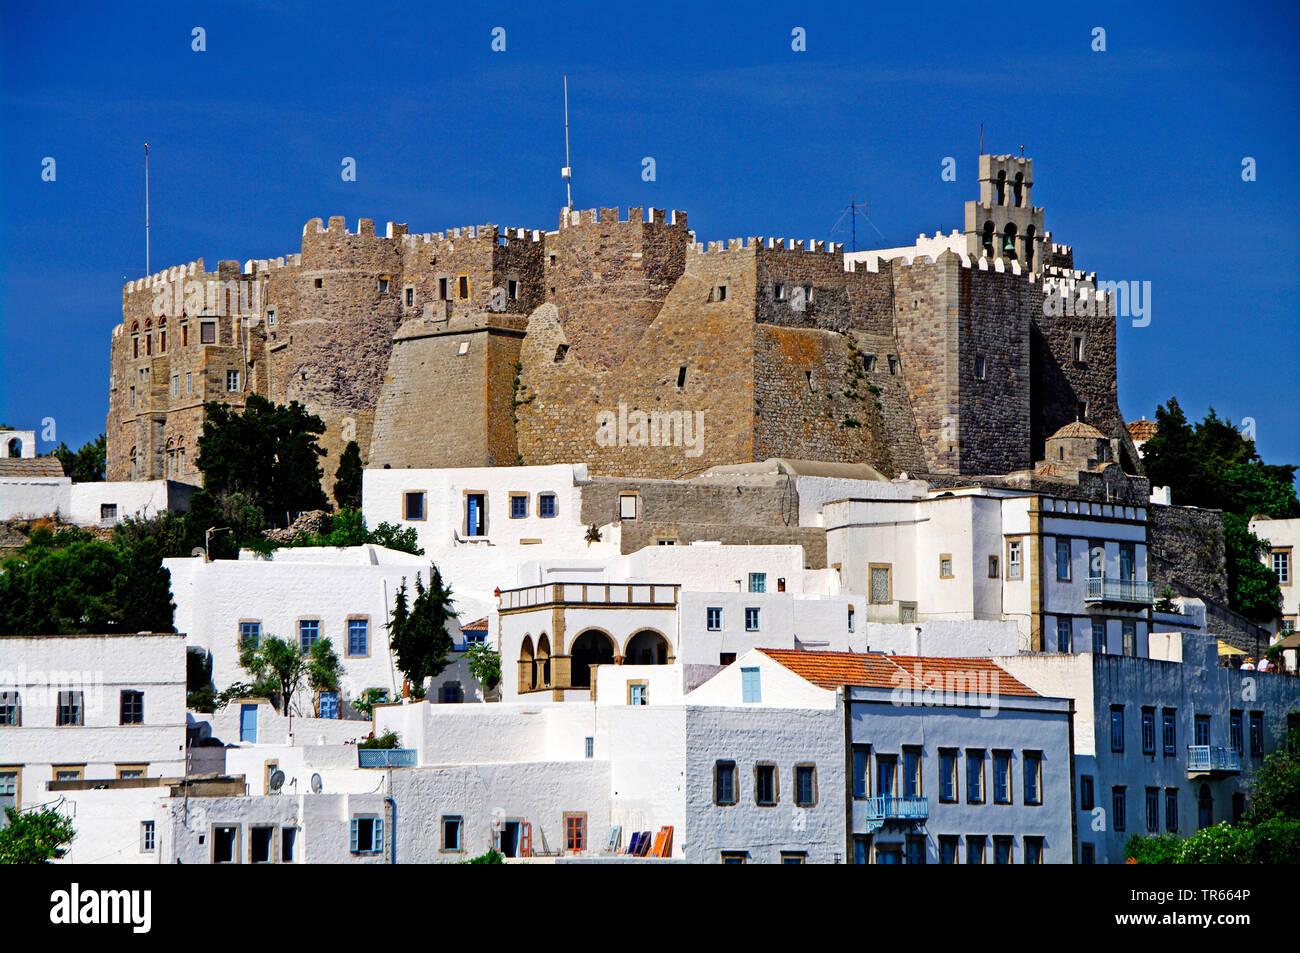 Burg von Bodrum, Tuerkei, Aegaeis, Bodrum   castle of Bodrum, Turkey, Aegean Sea, Bodrum   BLWS474689.jpg [ (c) blickwinkel/McPHOTO/J. Webeler Tel. +4 - Stock Image